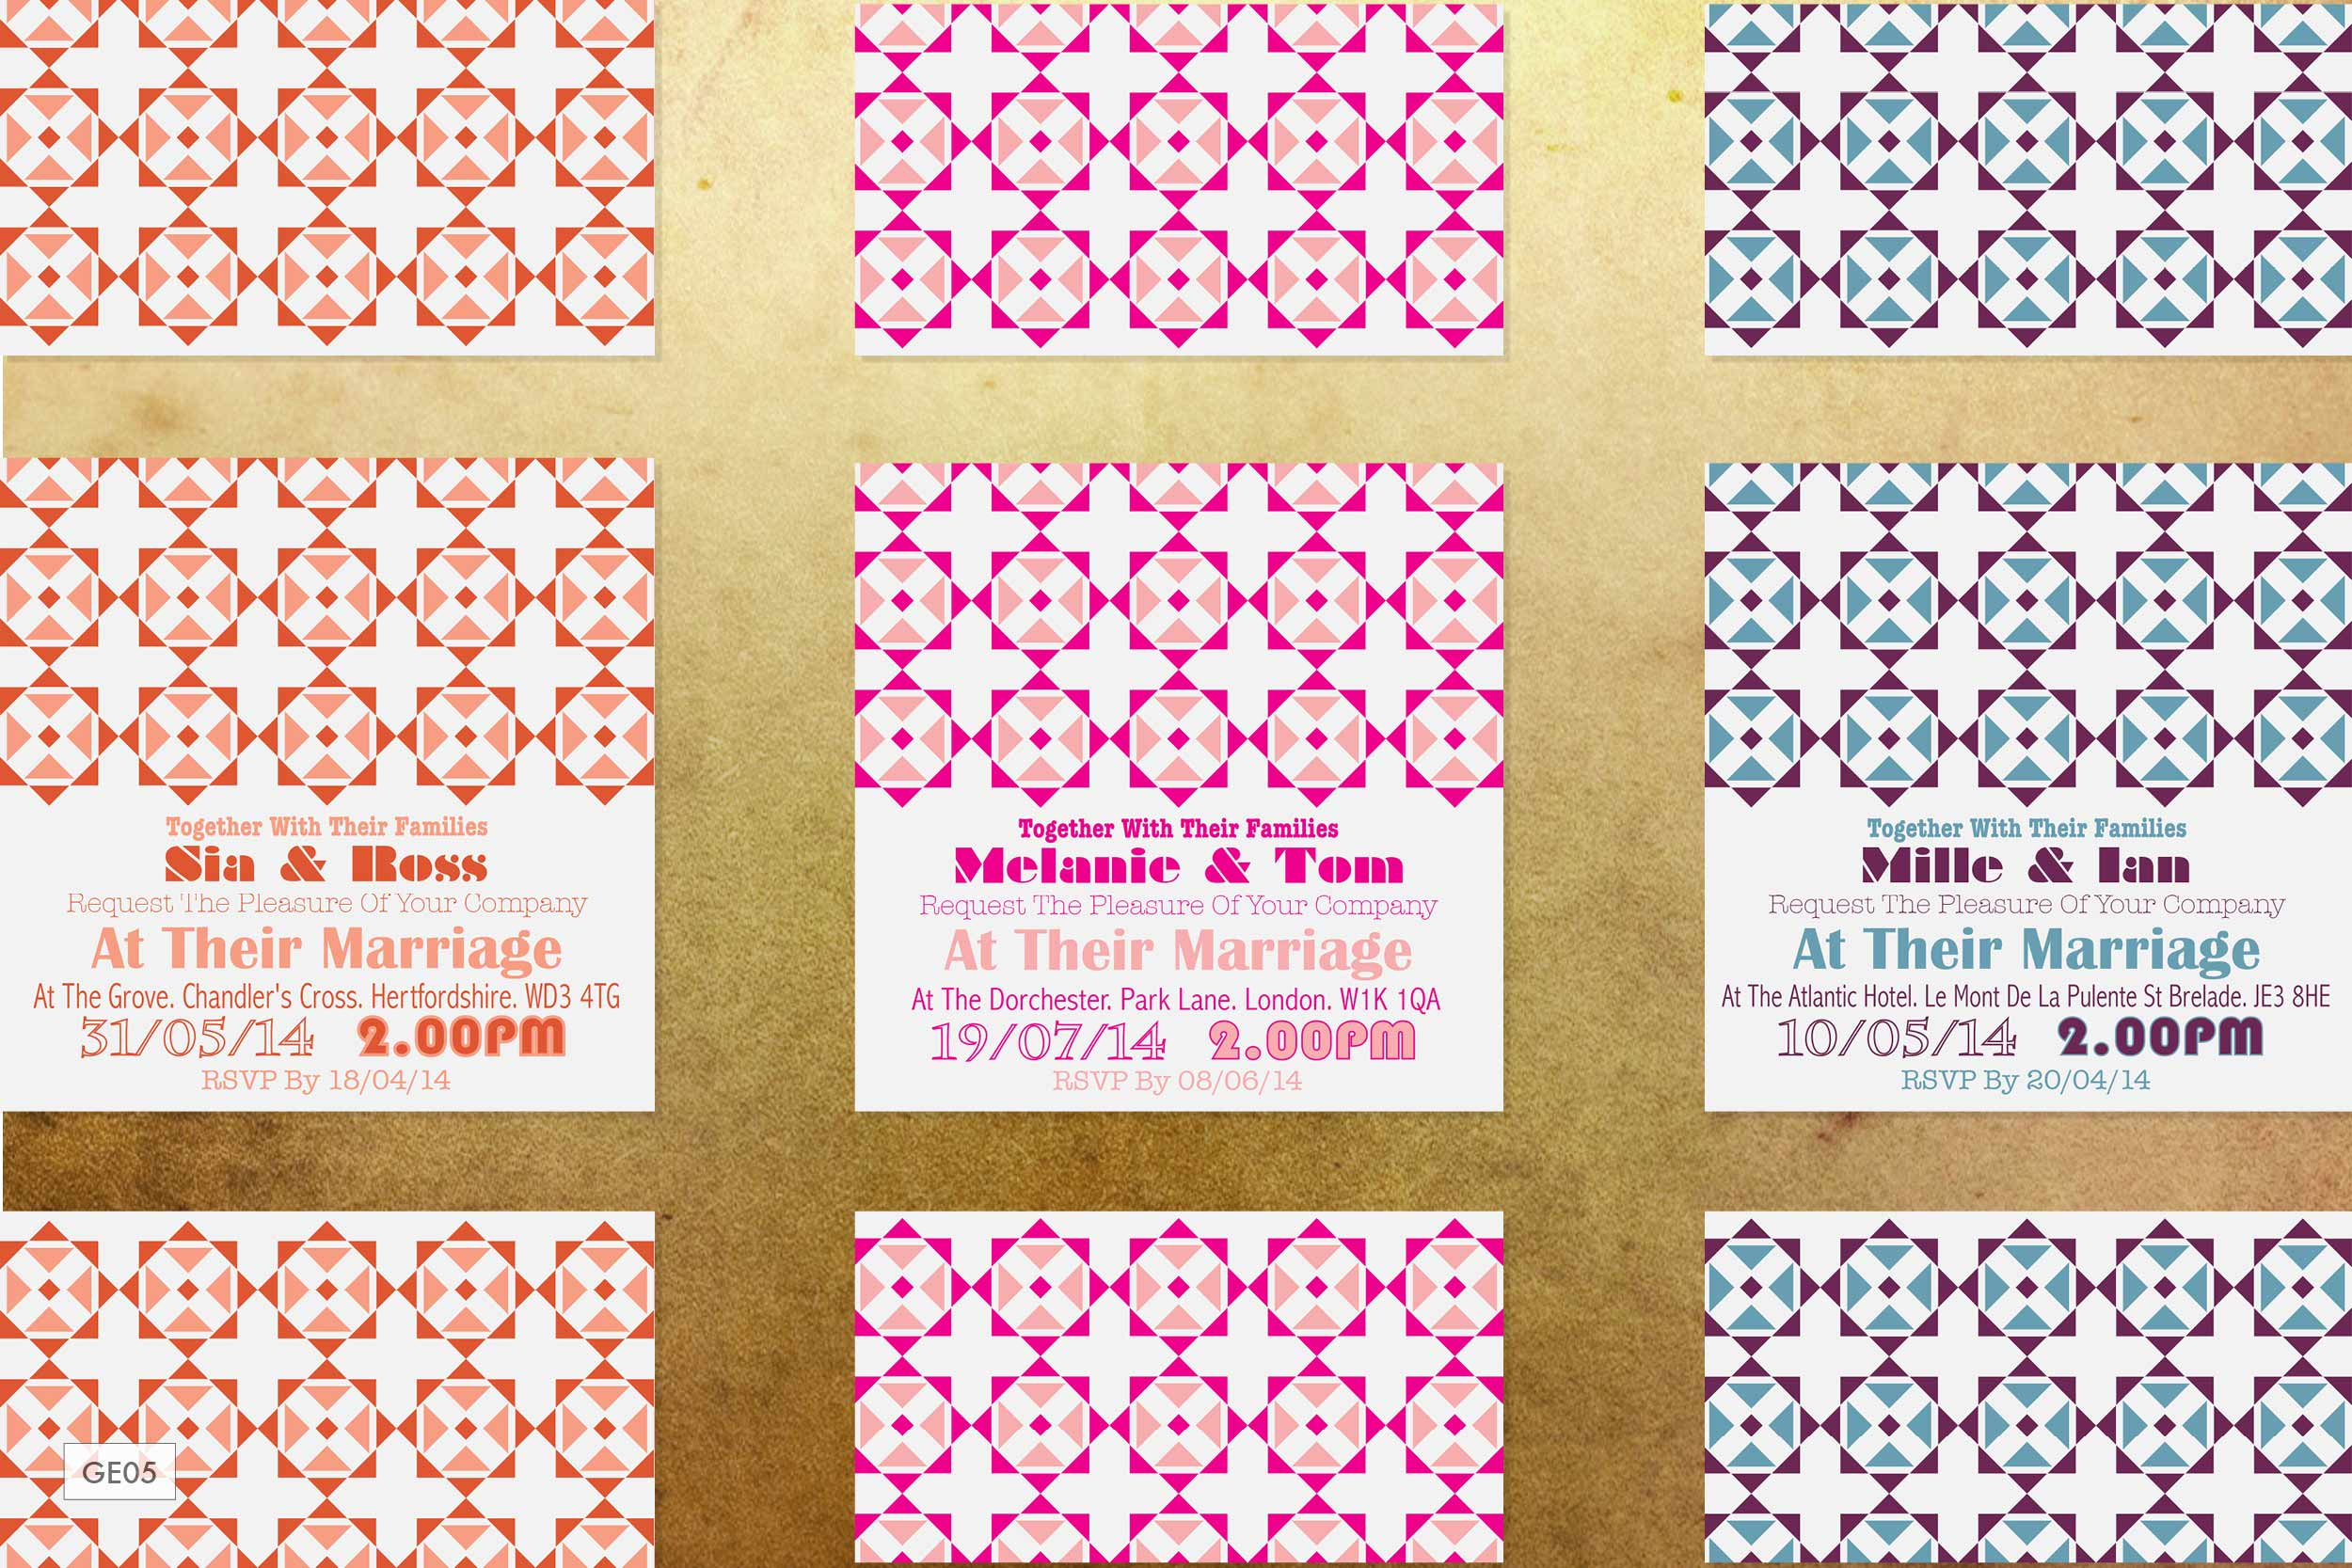 ananya-collection-scroll-gallery-geometric17.jpg